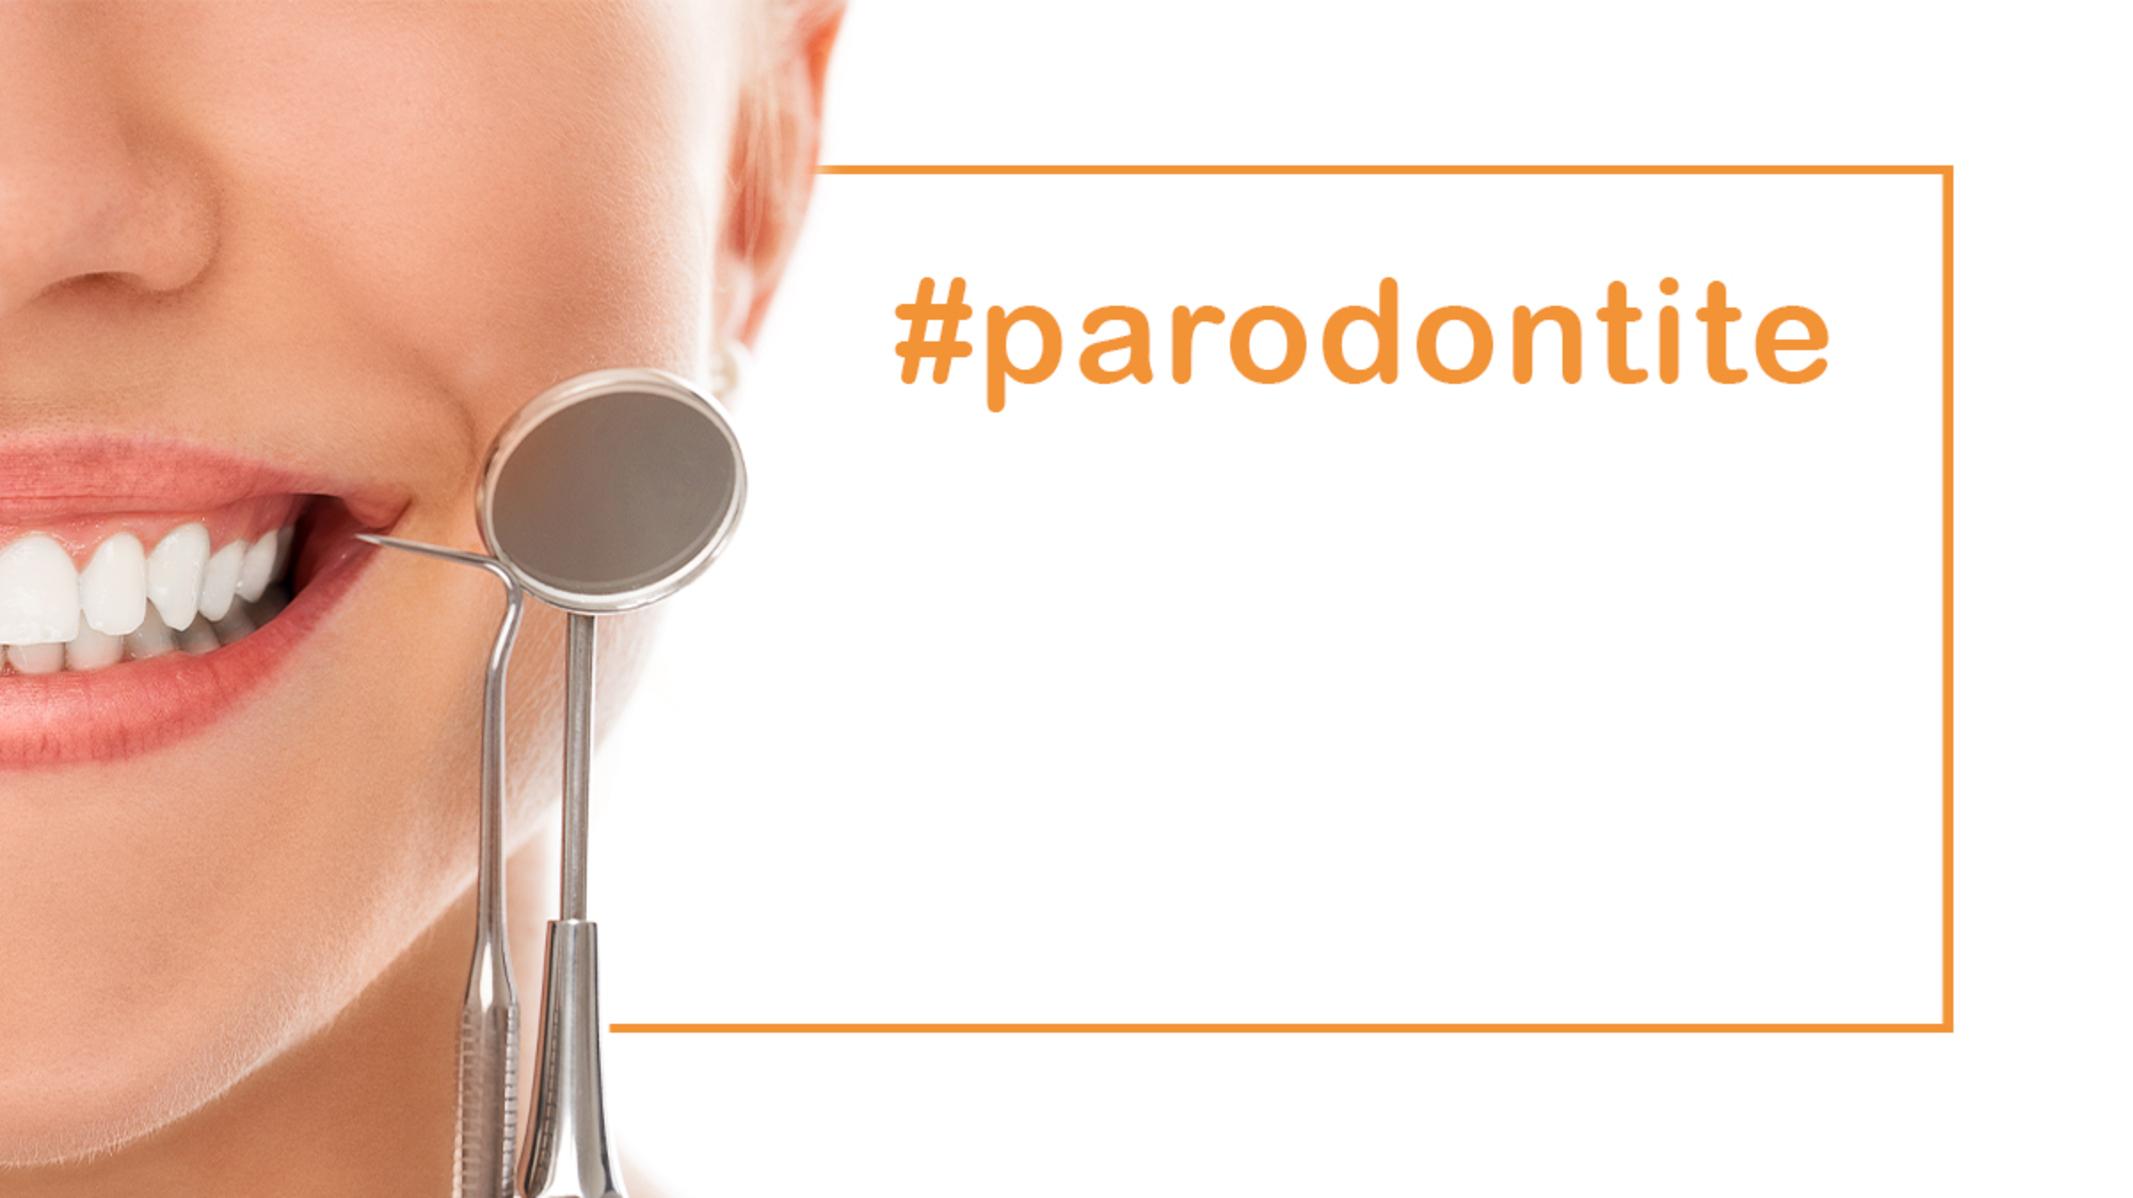 La parodontite: cause e terapie